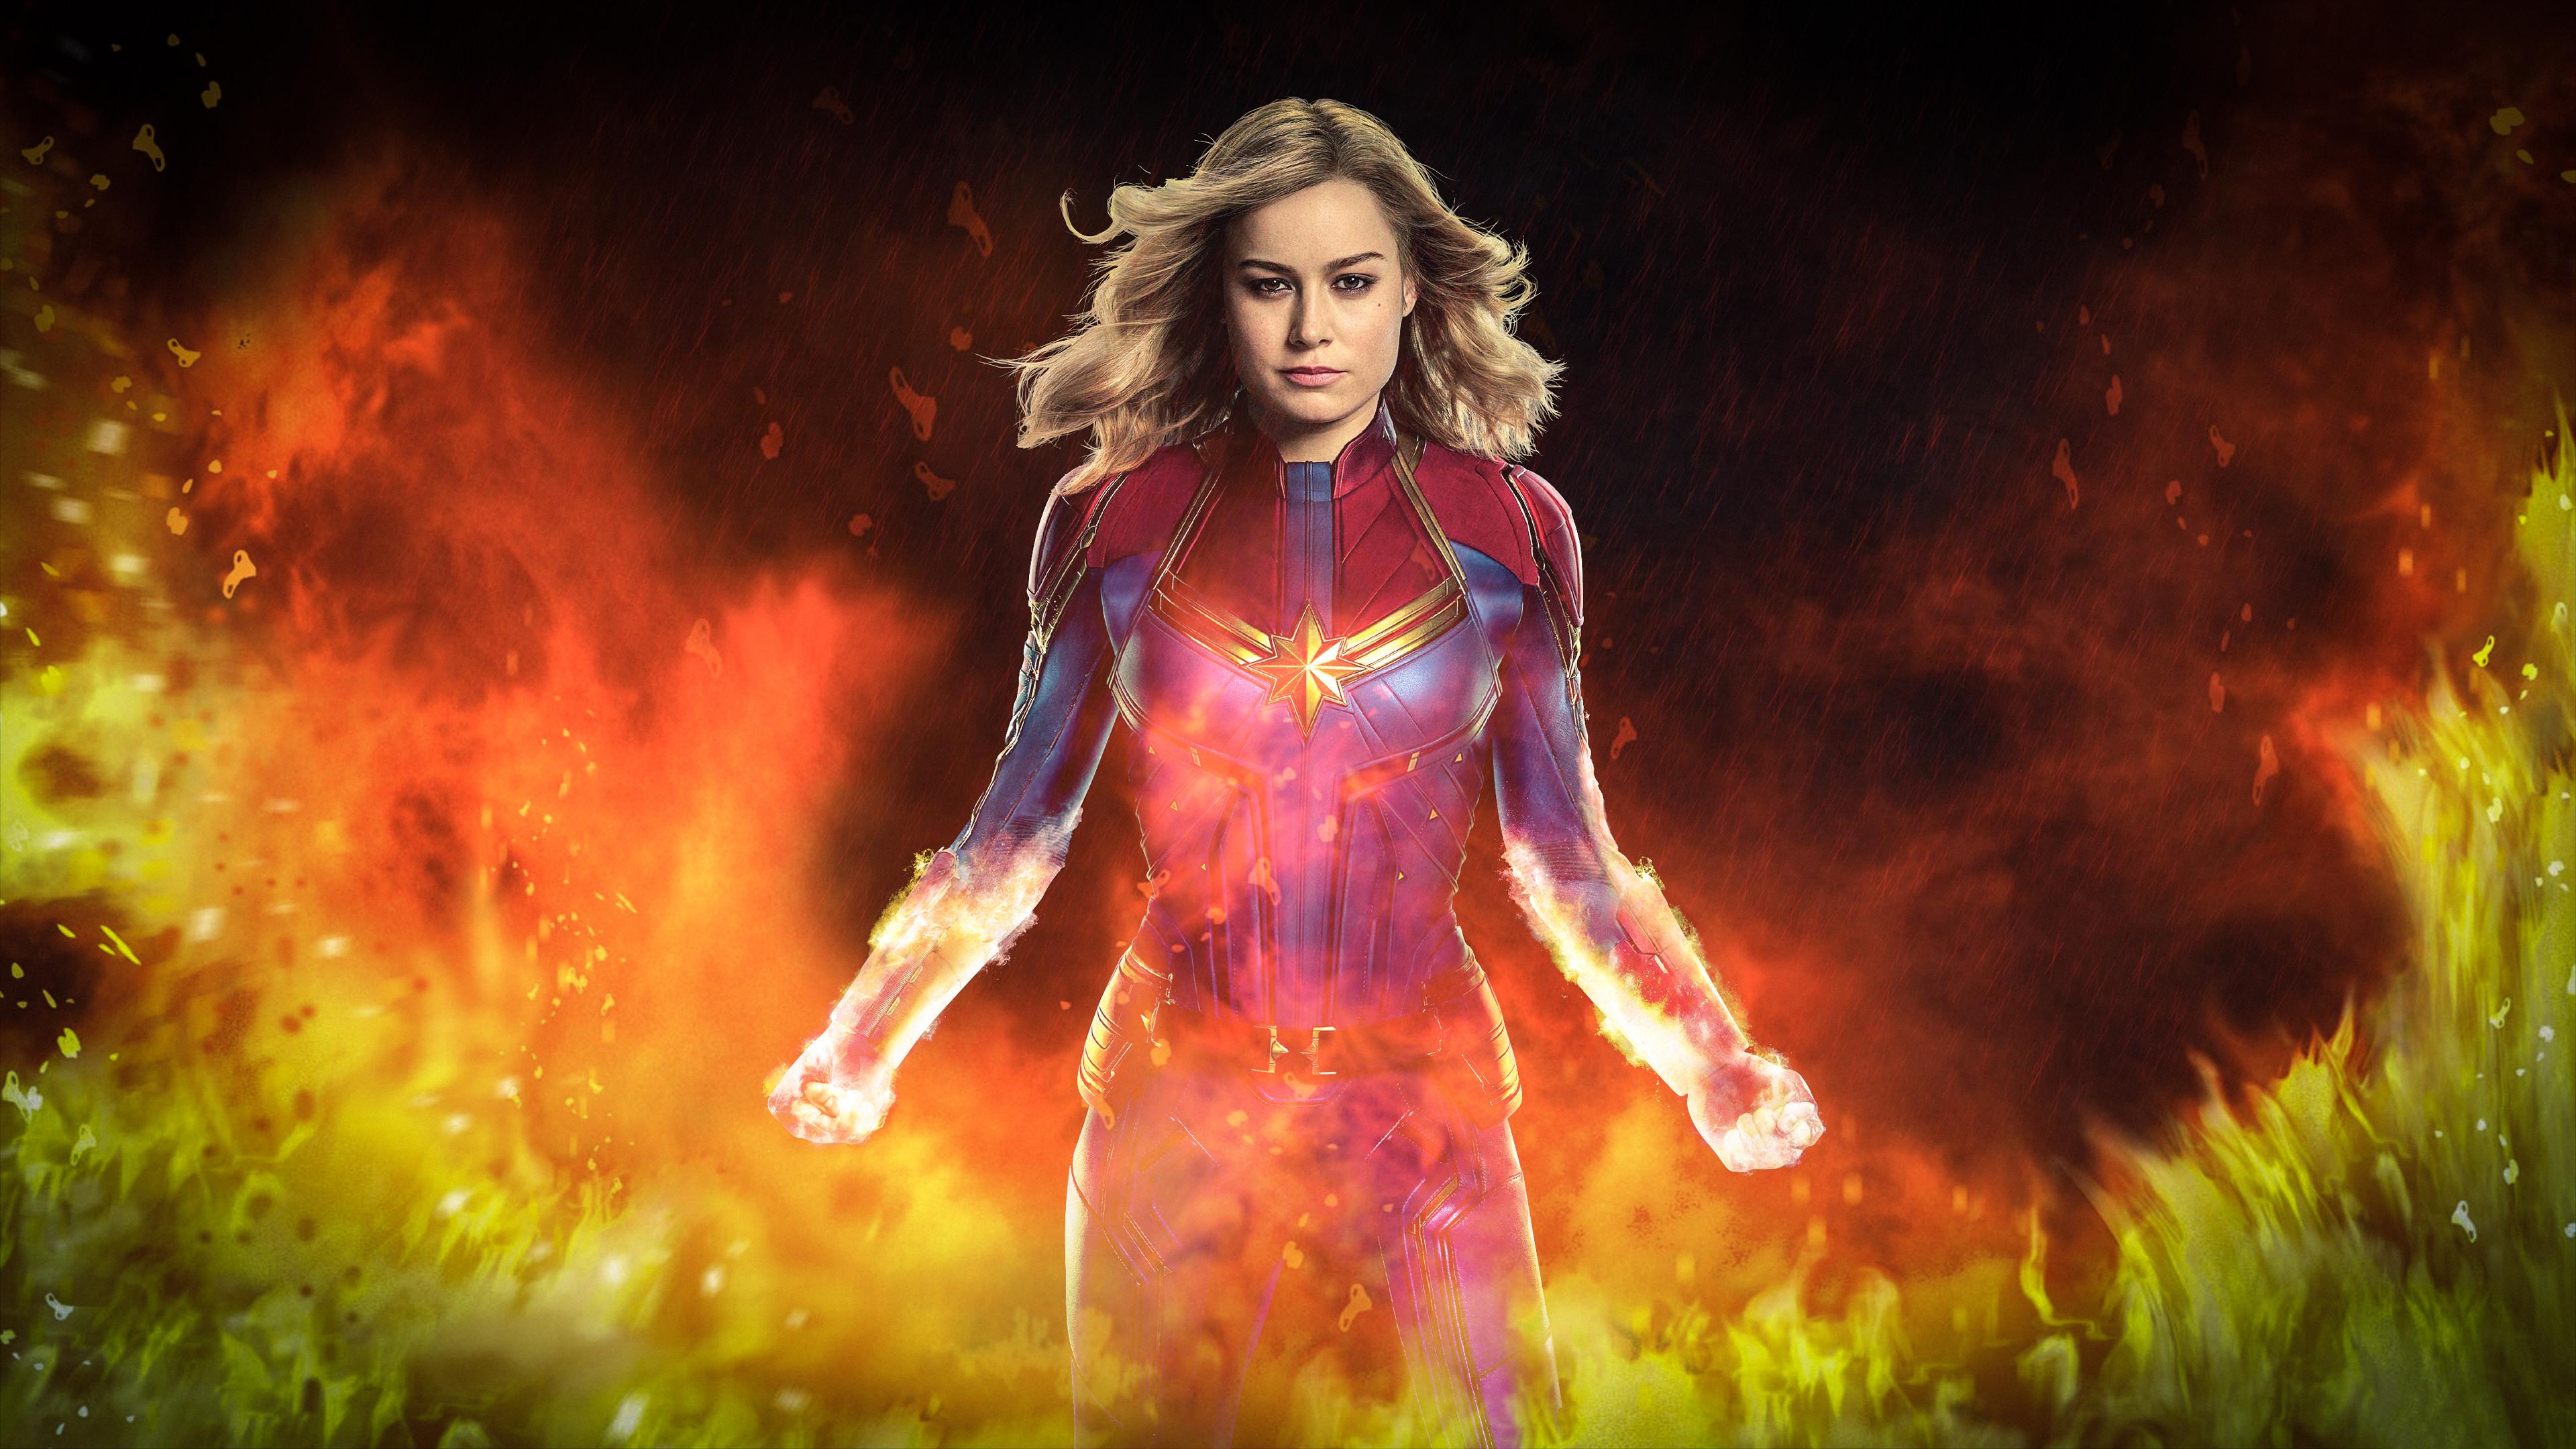 captain marvel movie 2019 brie larson as carol danvers 4k wallpaper 1544829332 - Captain Marvel Movie 2019 Brie Larson as Carol Danvers 4K Wallpaper - Captain Marvel (Movie 2019), Captain Marvel (Carol Danvers)